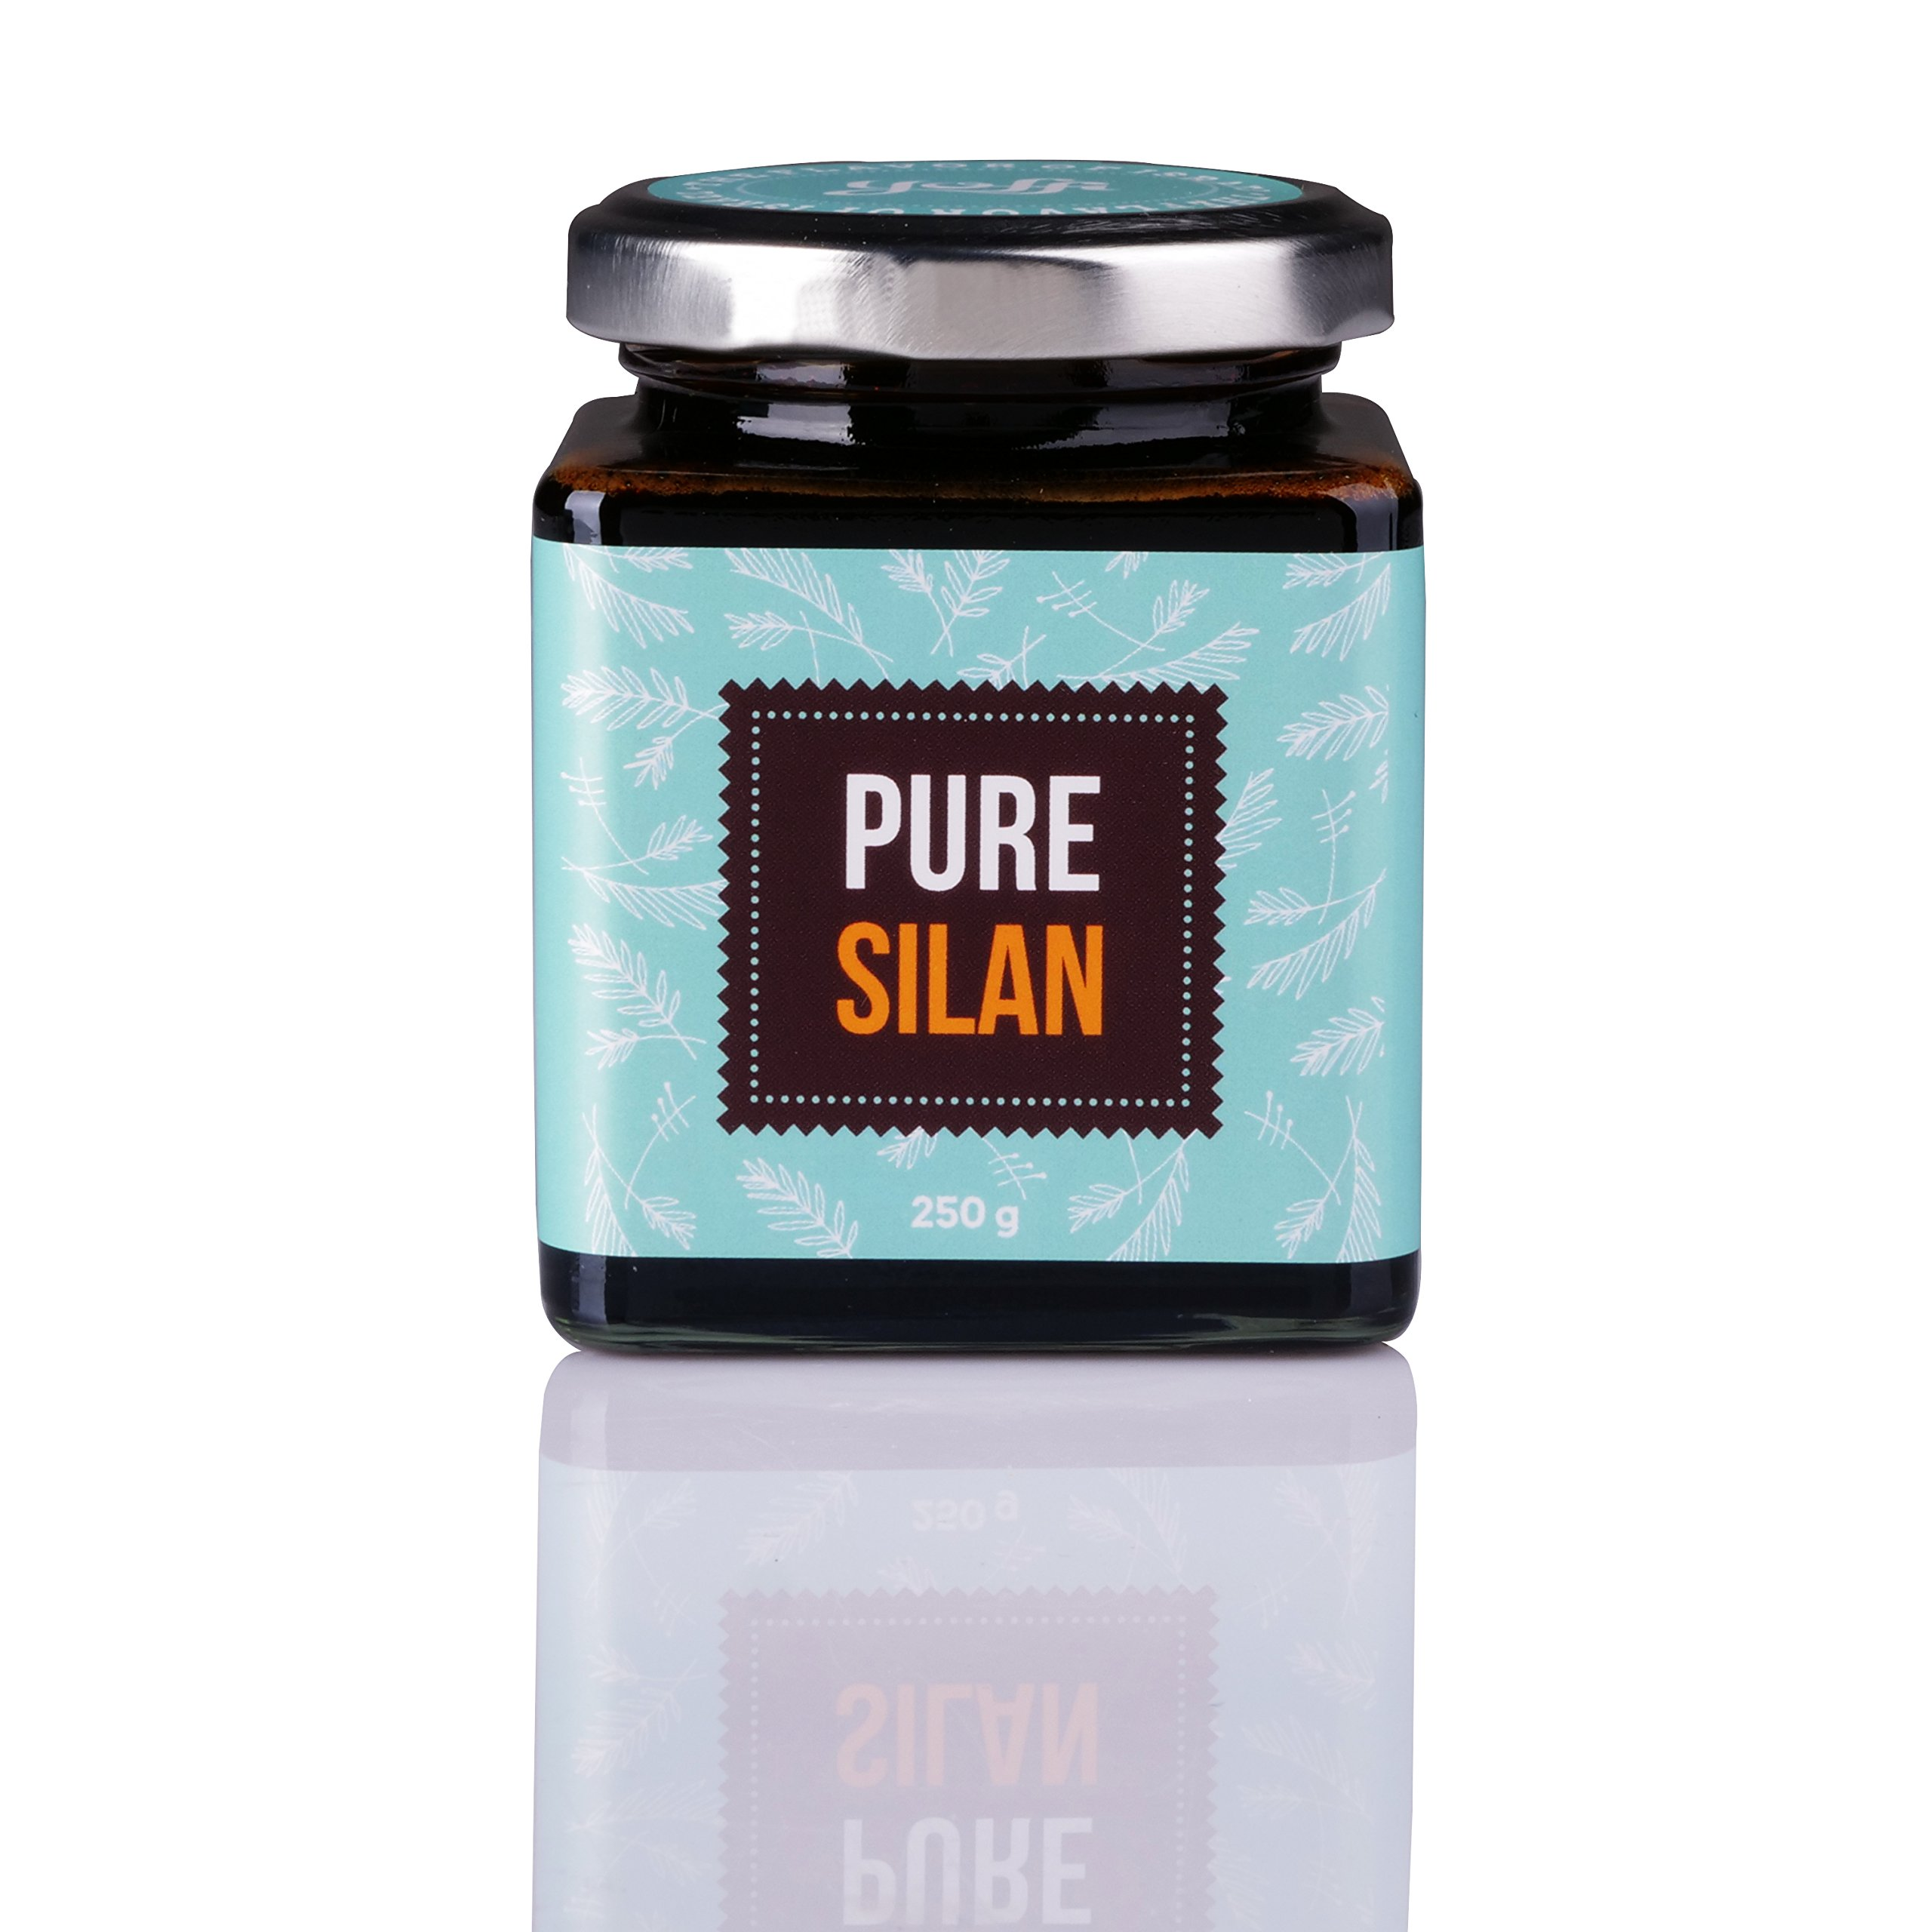 Yoffi 100% Pure & Natural Date Syrup Pure Silan | Vegan Syrup | Healthy Sweet Sugar Free| Healthy Natural Date Syrup Pure Silan | Non GMO Dairy Free | Vegan-Friendly & Kosher Pareve 8.8 Oz